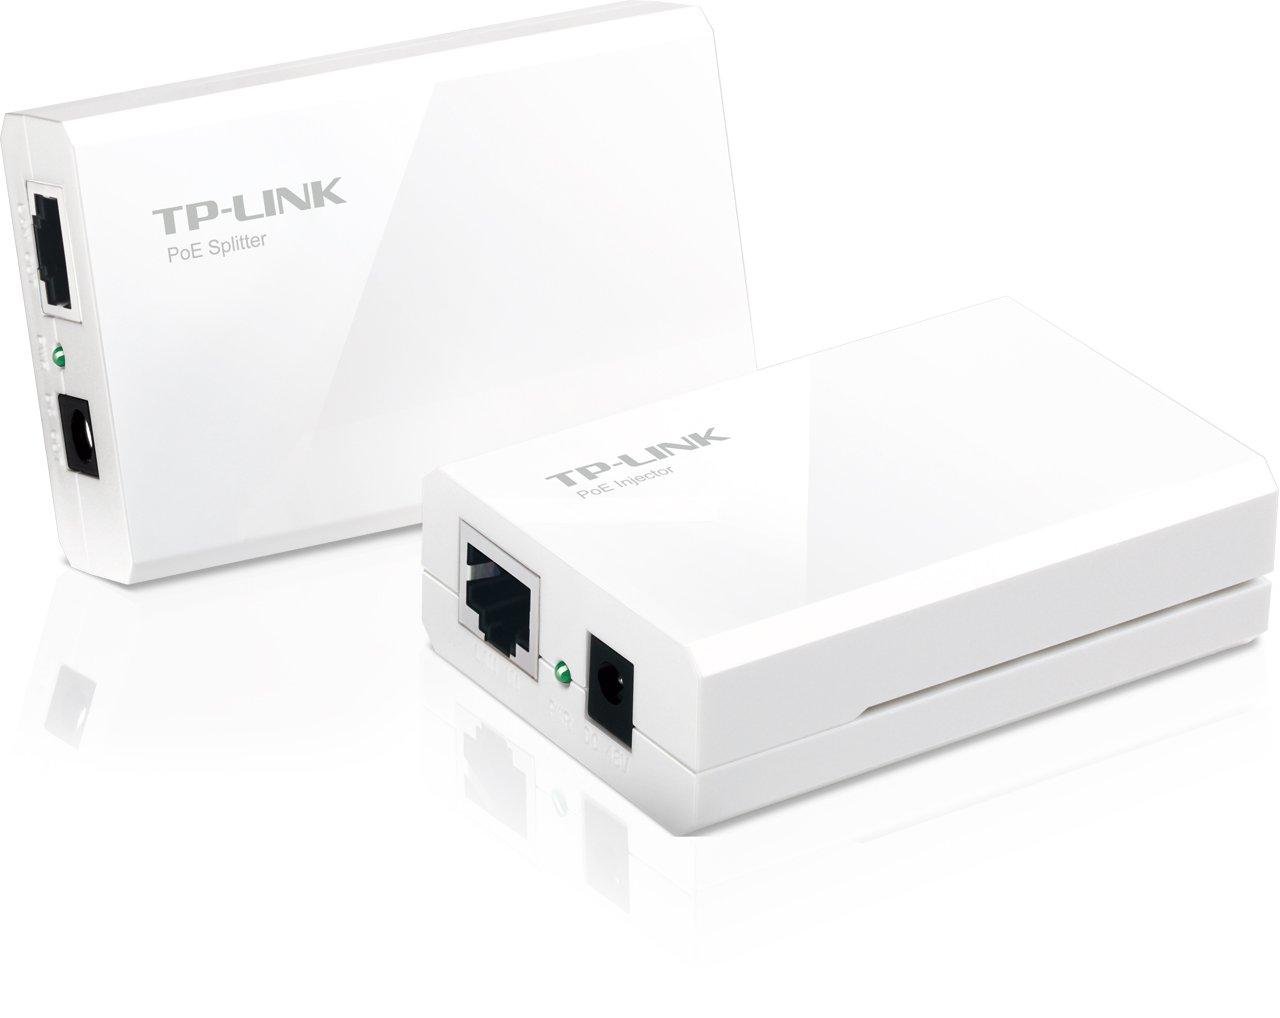 TP-LINK Power over Ethernet Adapter Kit (TL-POE200)